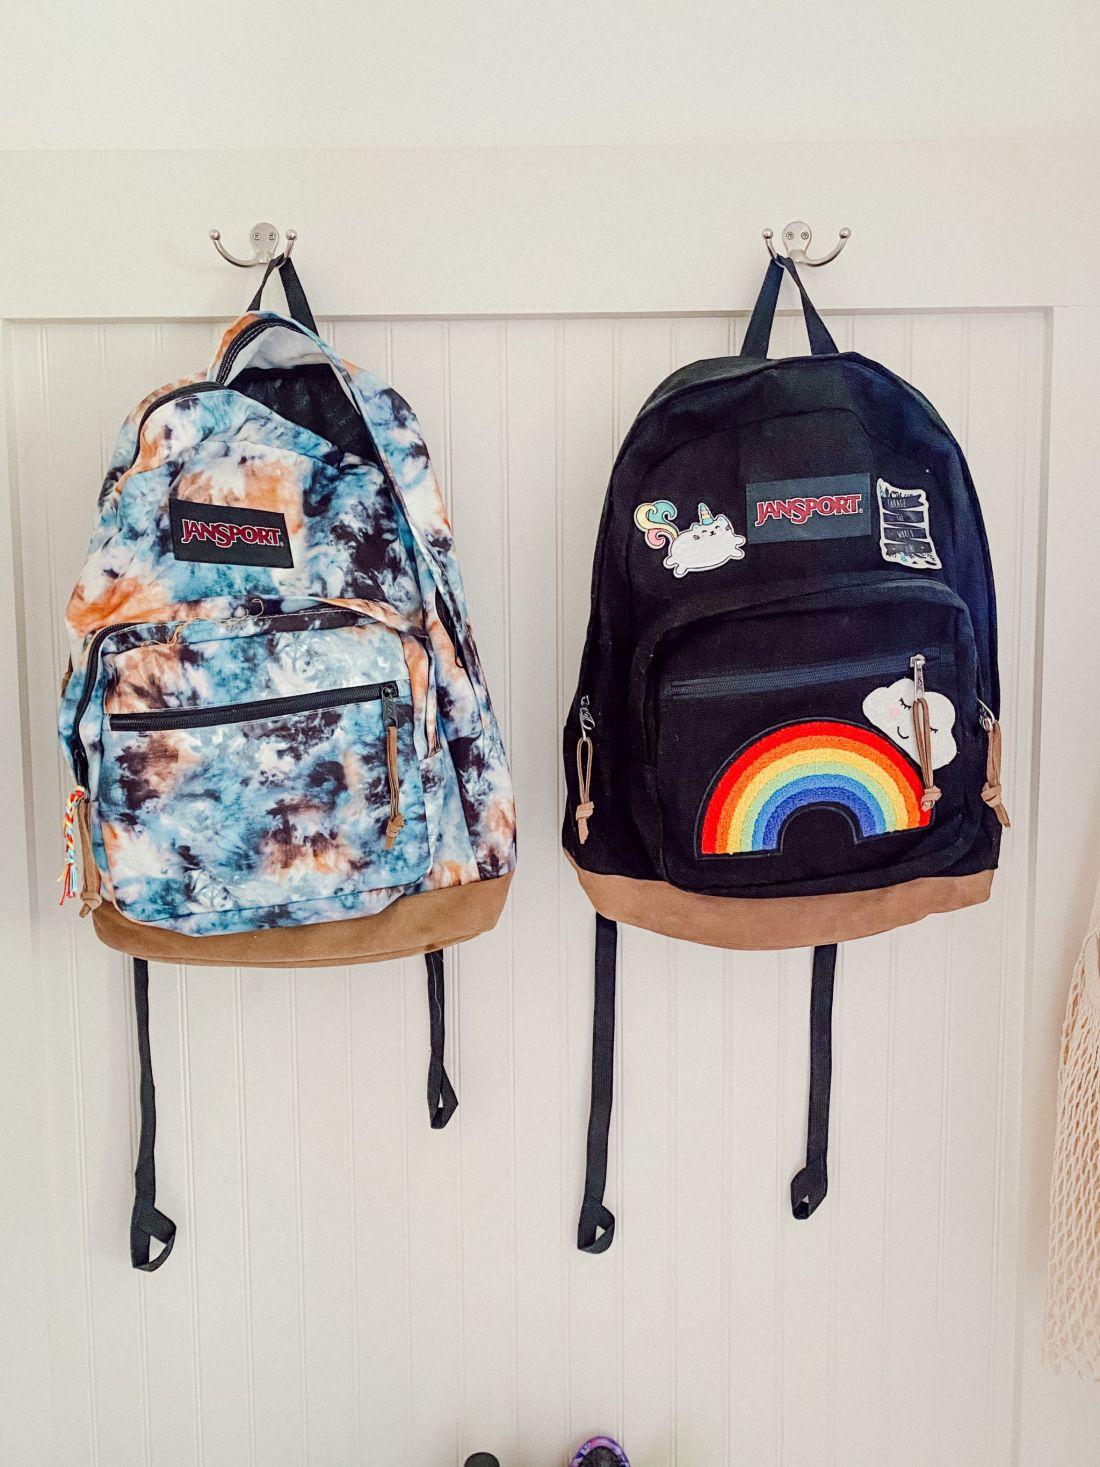 Back to School Shopping Guide by popular Nashville motherhood blog, Modern Day Moguls: image two Jansport backpacks hanging on wall mounted hooks.